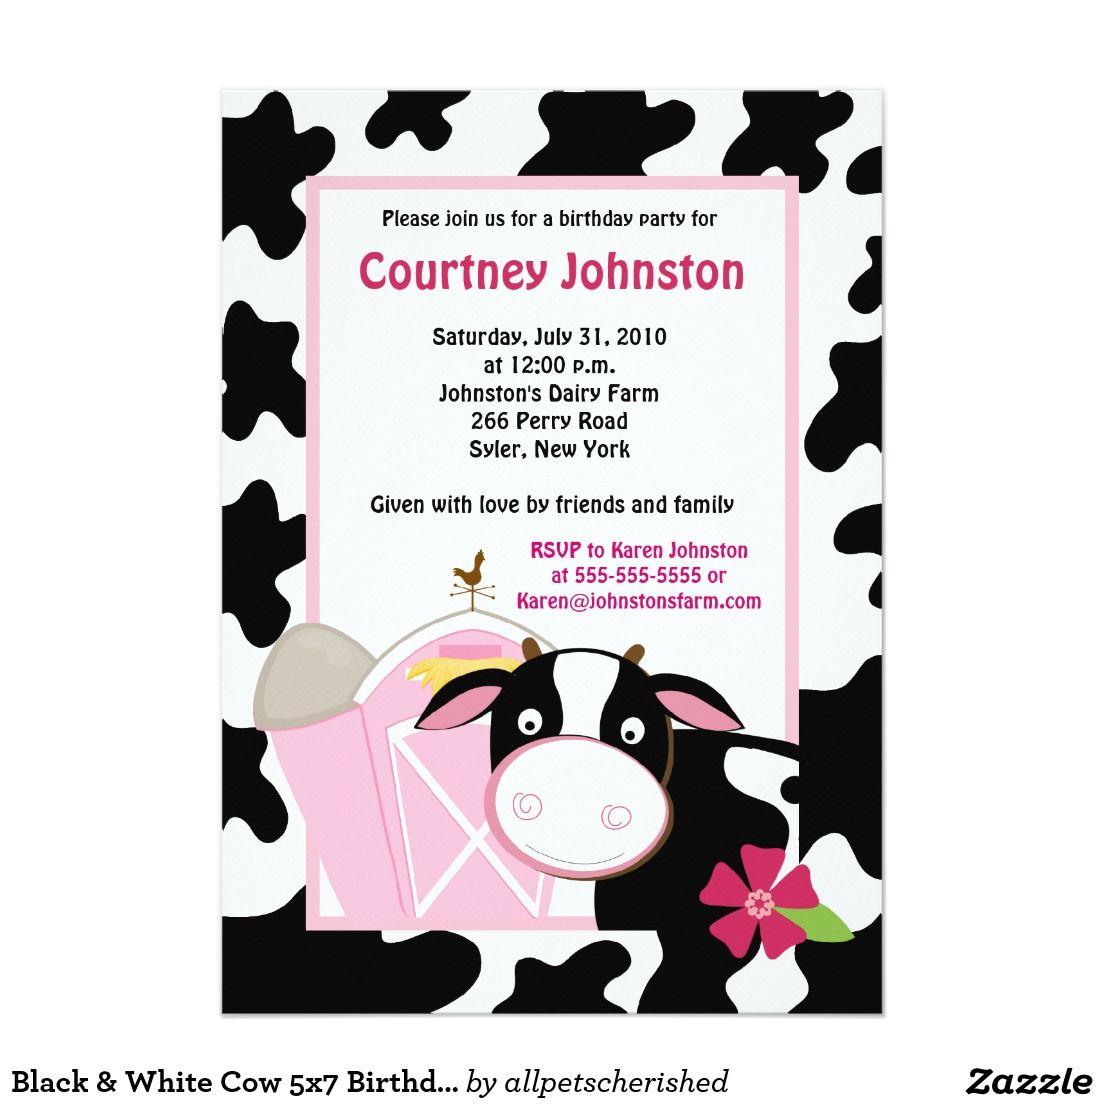 Black & White Cow 5x7 Birthday Invitation | Cow, Birthdays and Black